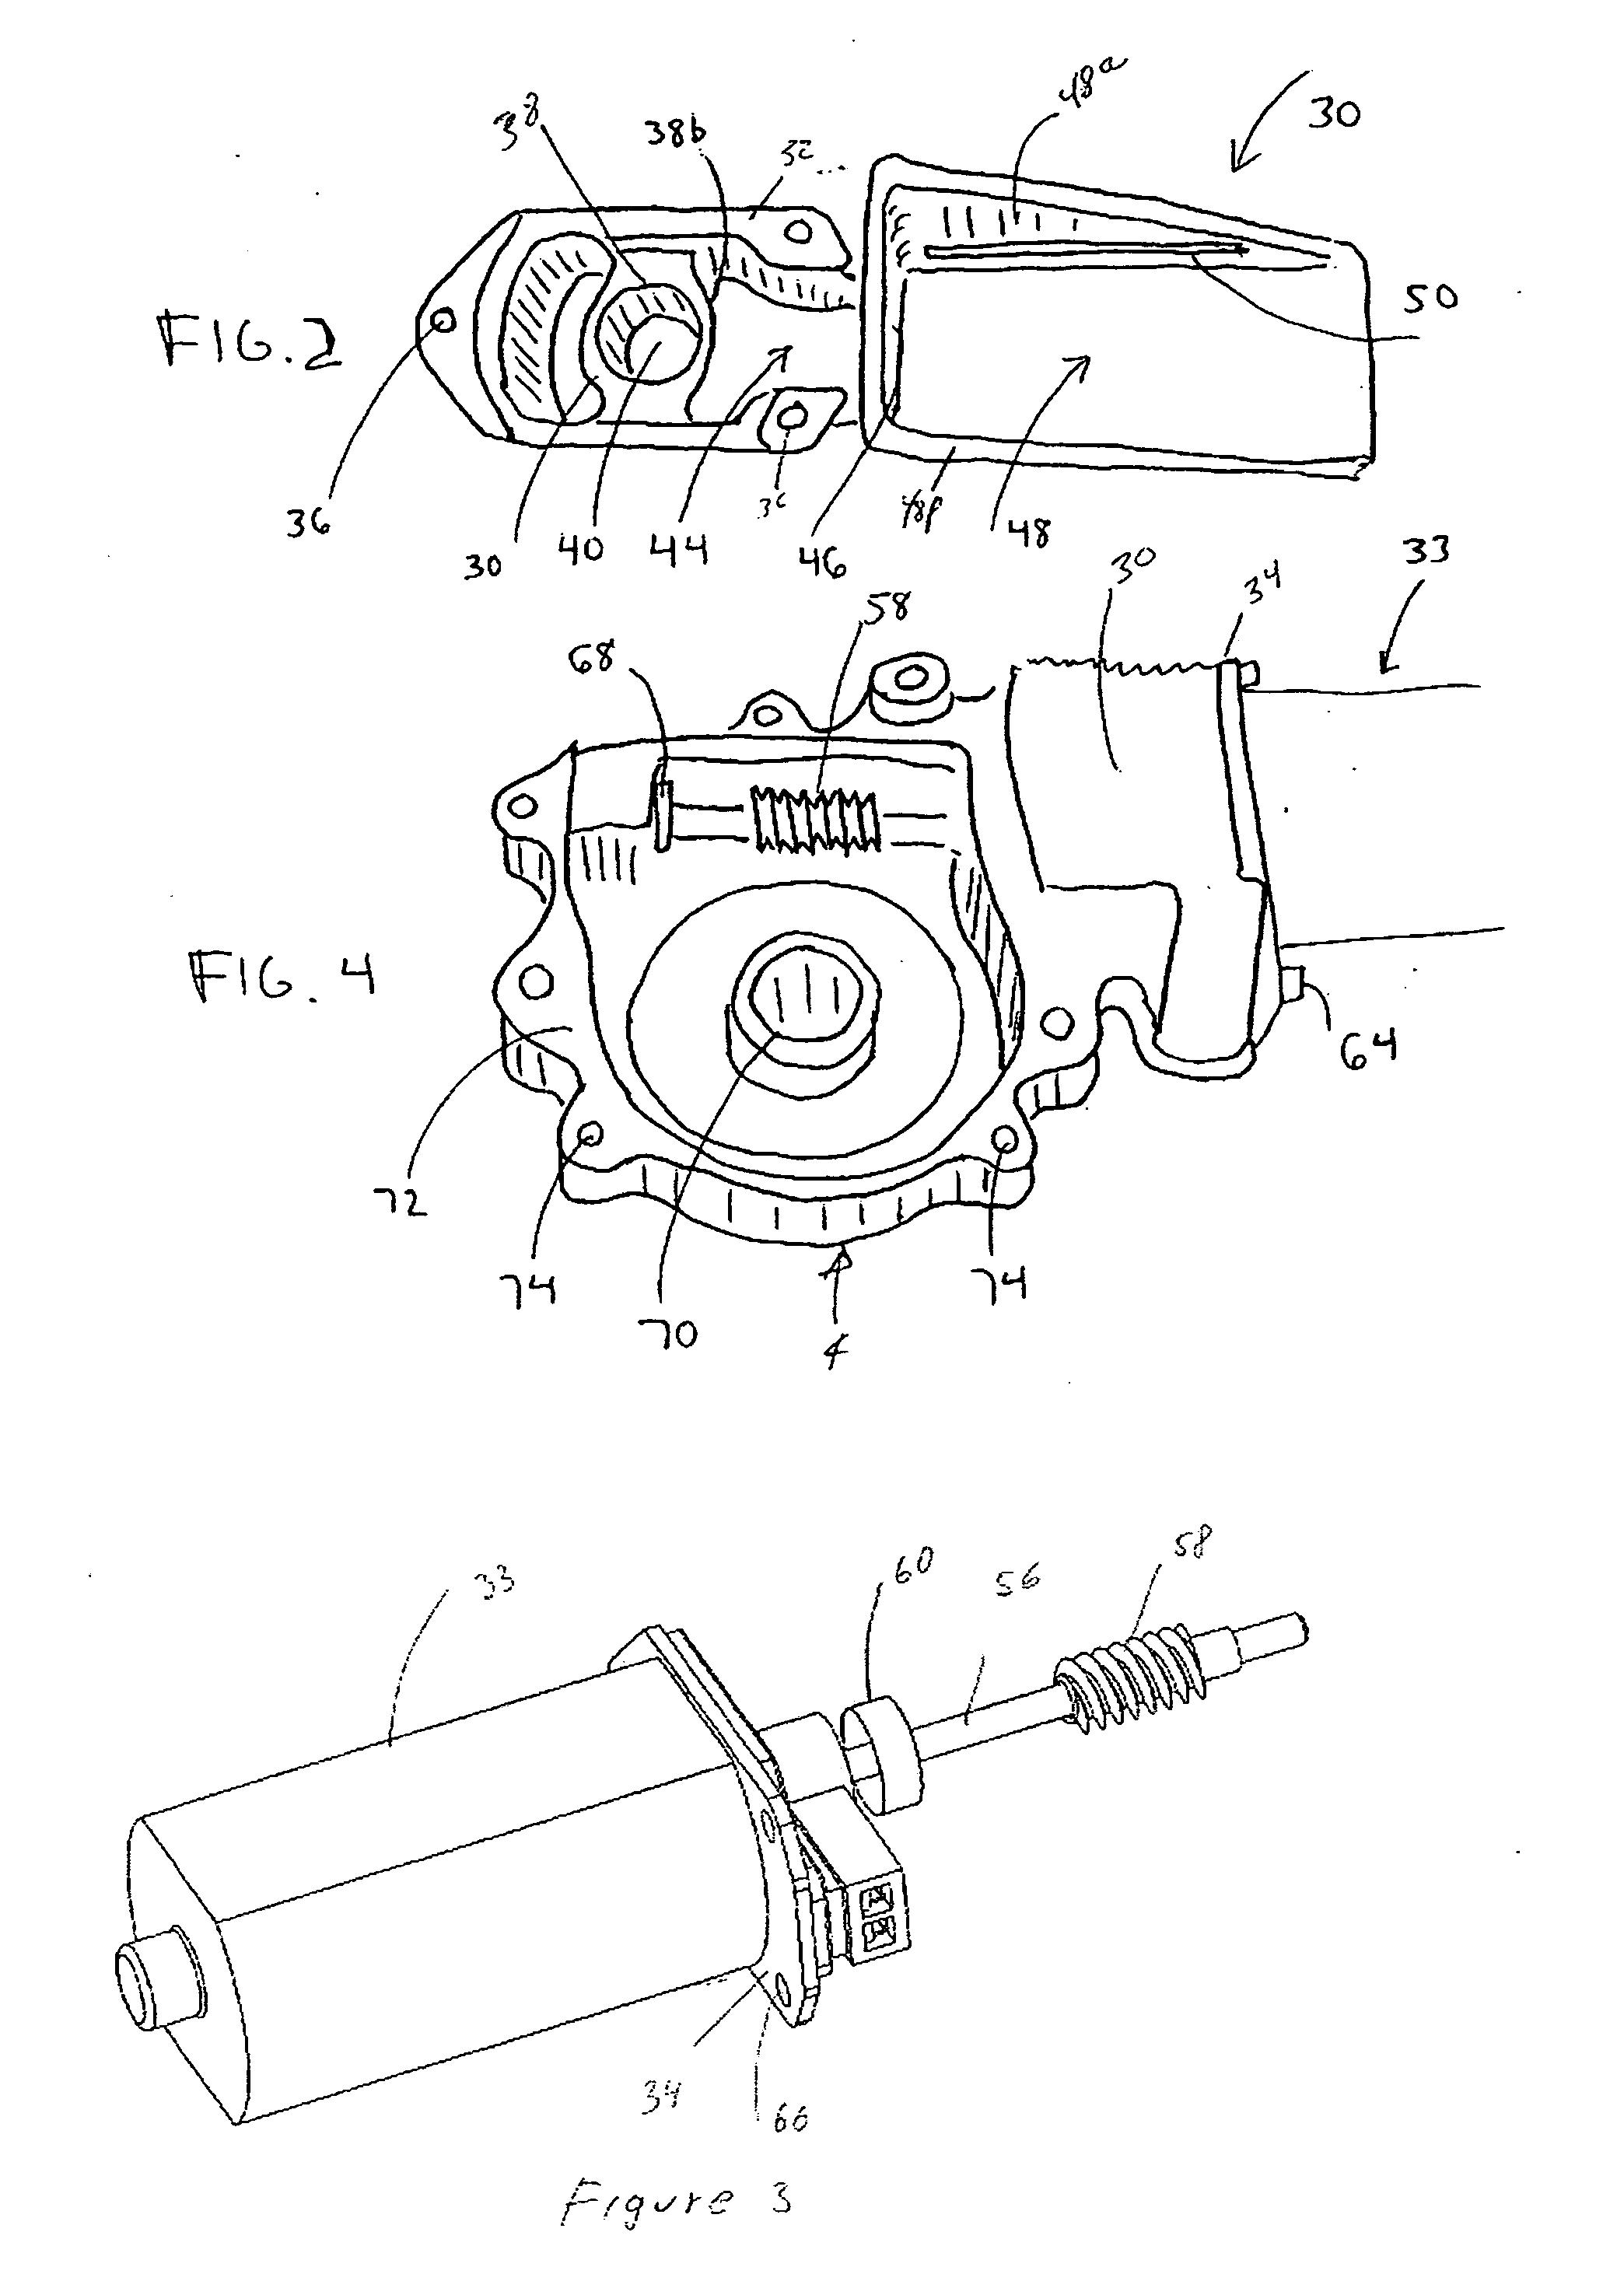 Dodge Avenger Ignition Wiring Diagrams Com